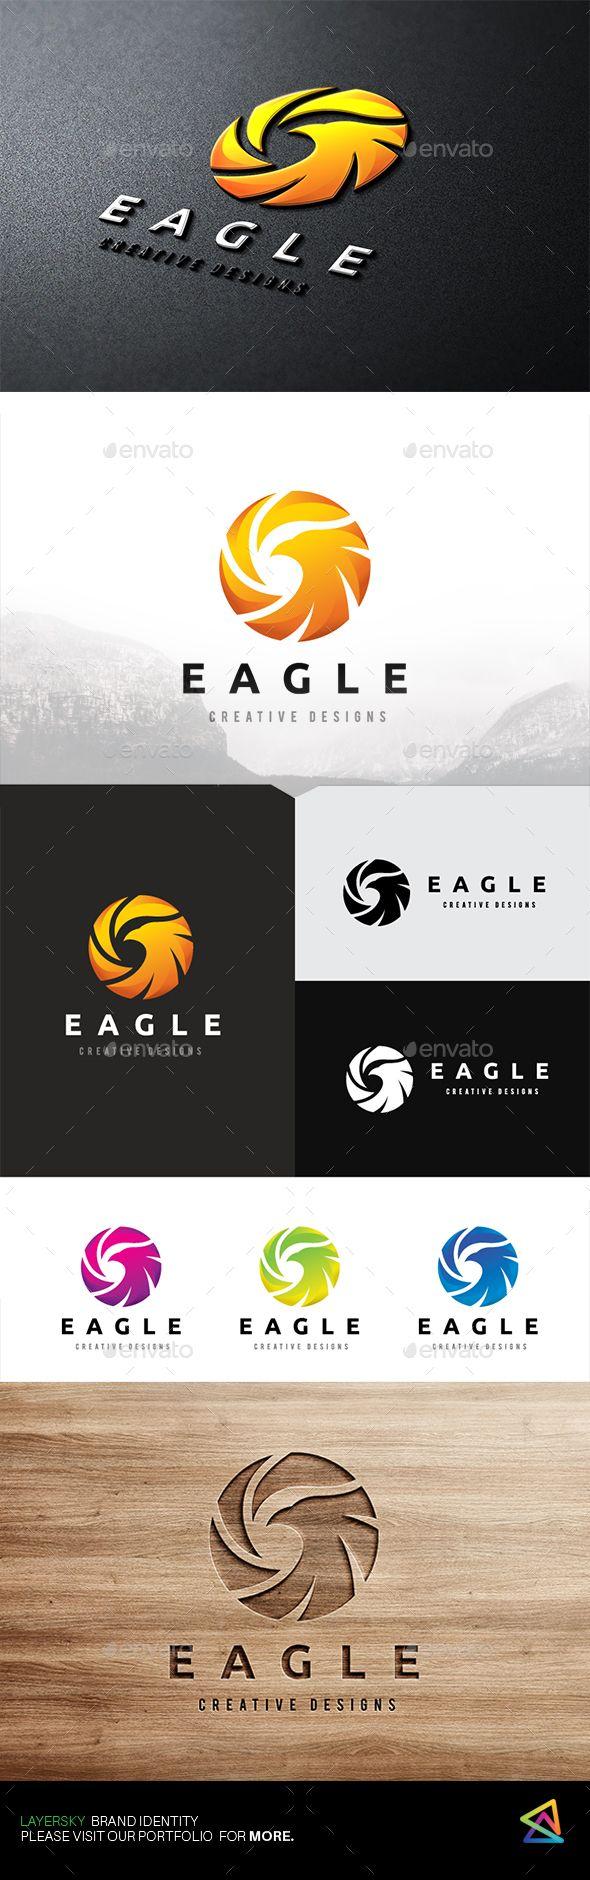 Eagle Logo — Vector EPS #motor show #red • Download ➝ https://graphicriver.net/item/eagle-logo/19487425?ref=pxcr